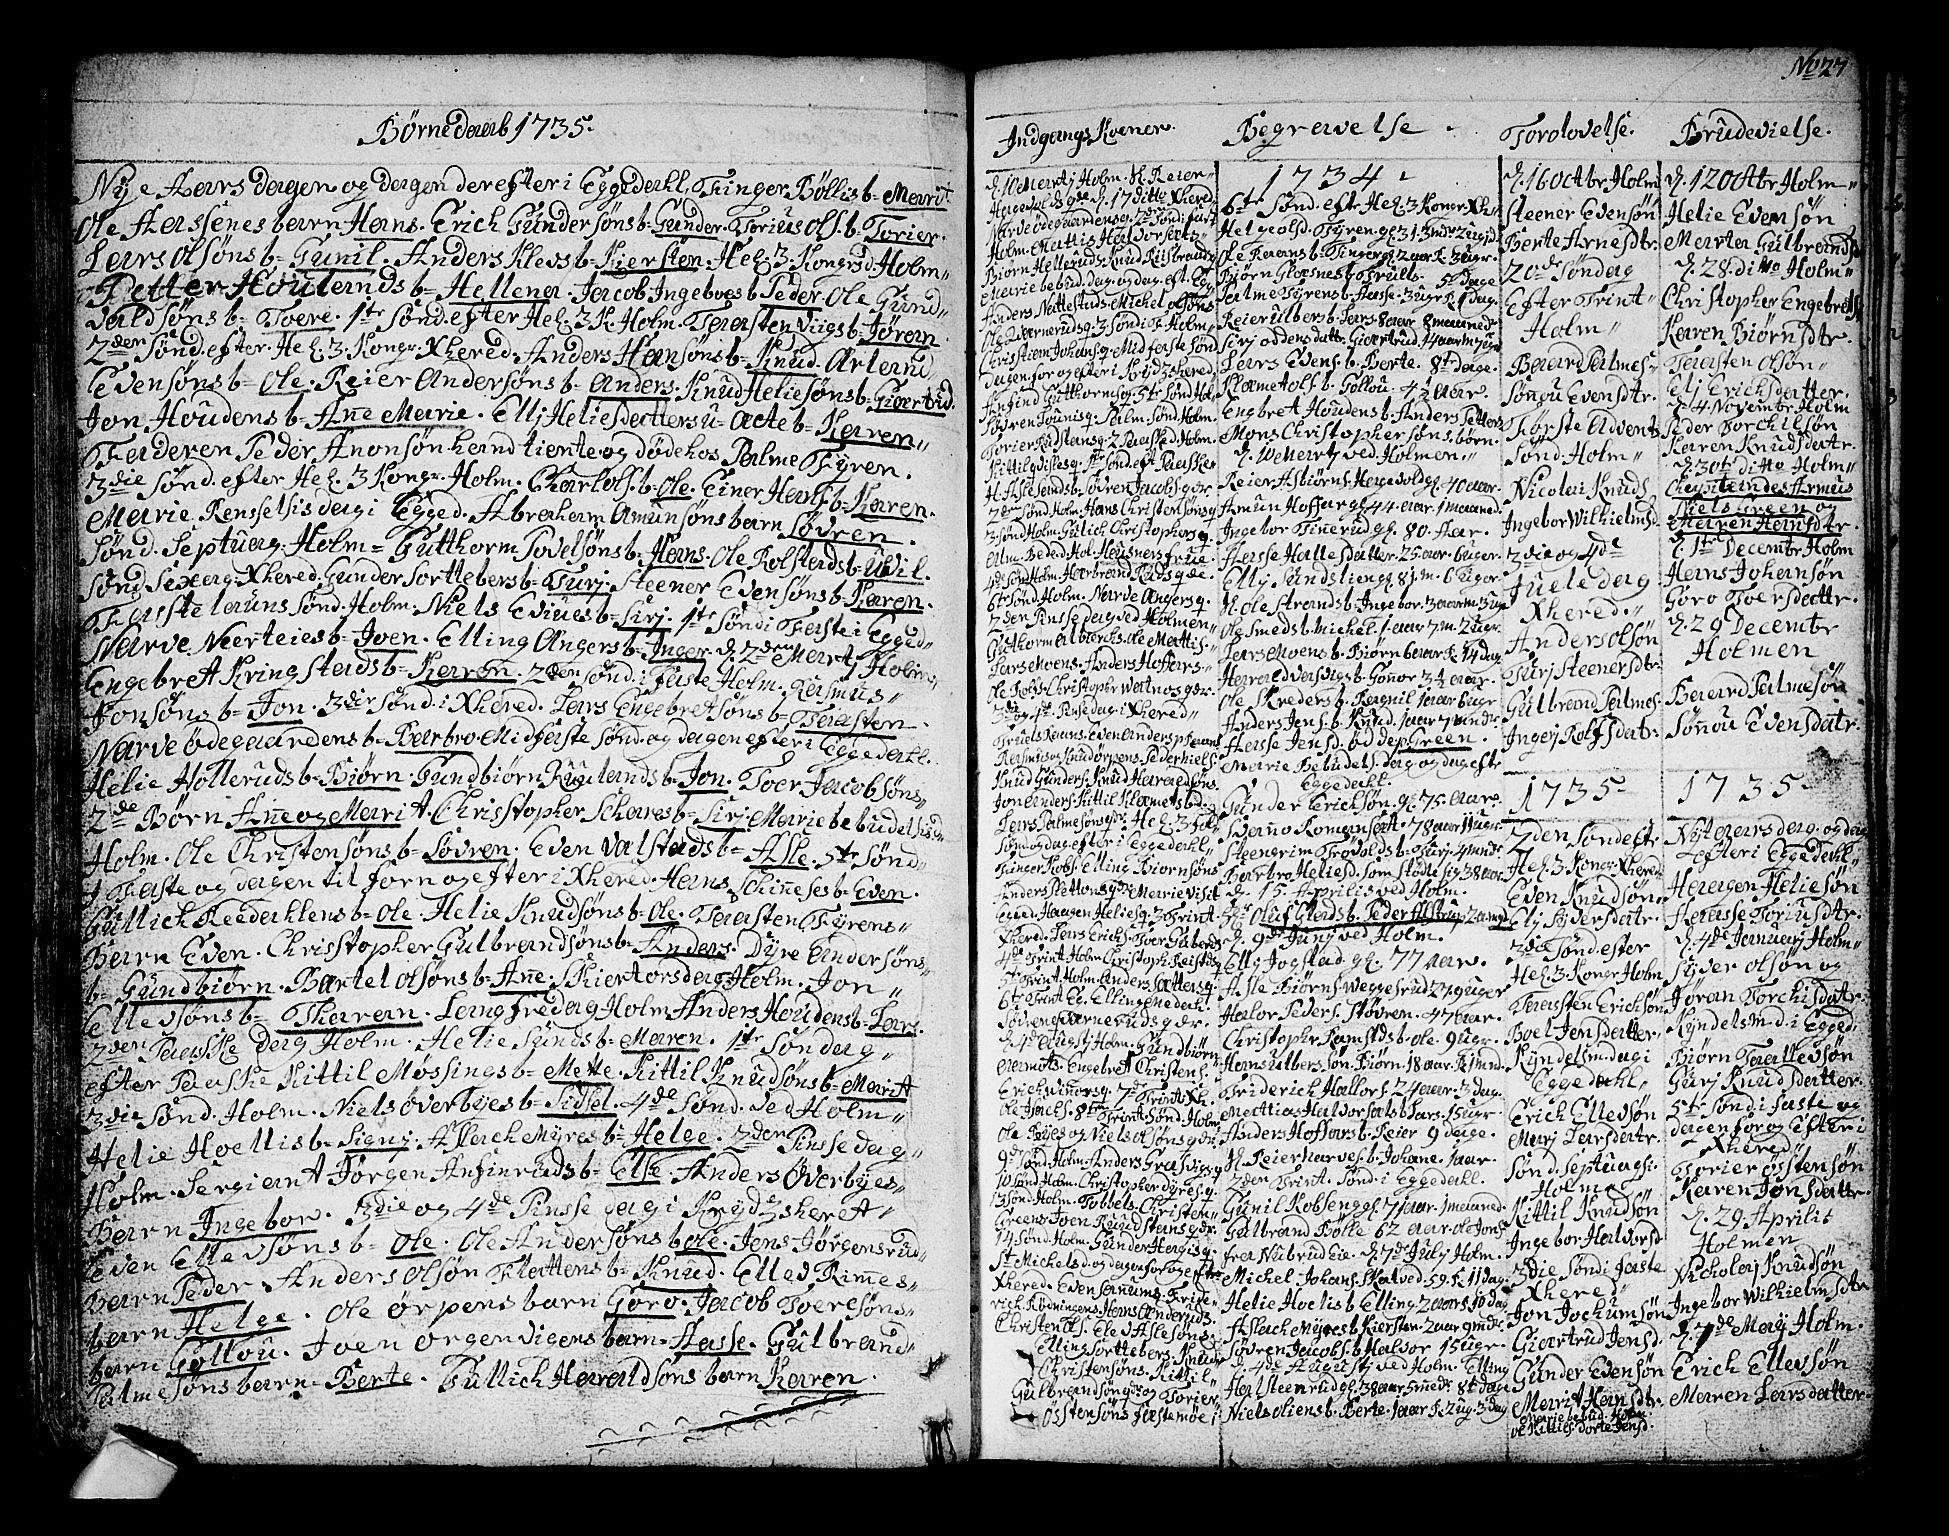 SAKO, Sigdal kirkebøker, F/Fa/L0001: Parish register (official) no. I 1, 1722-1777, p. 27